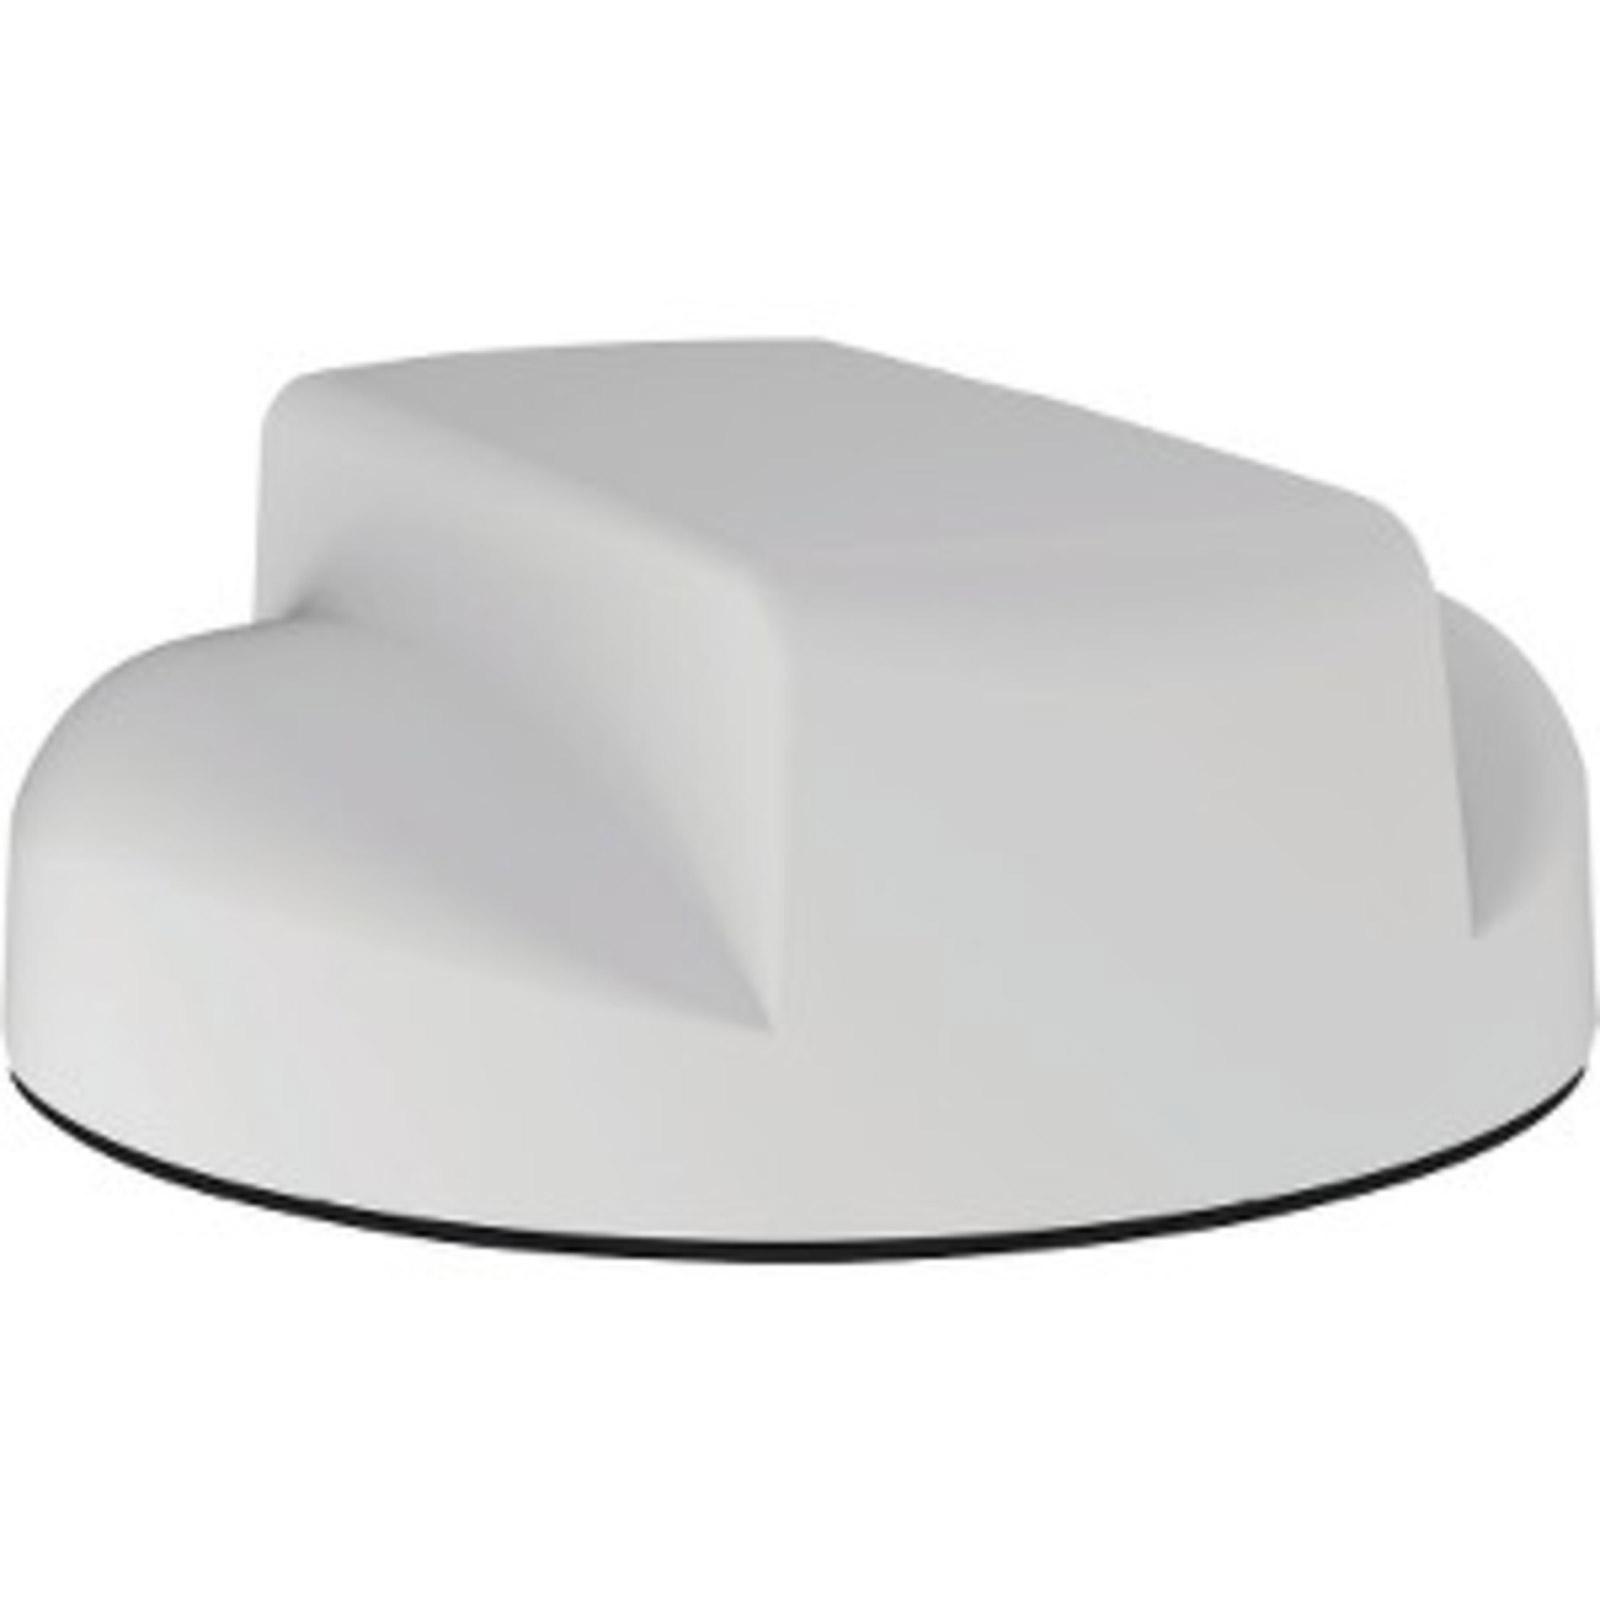 Sierra Wireless Antenna White 6-IN-1 DOME 6001121 2XLTE GNSS